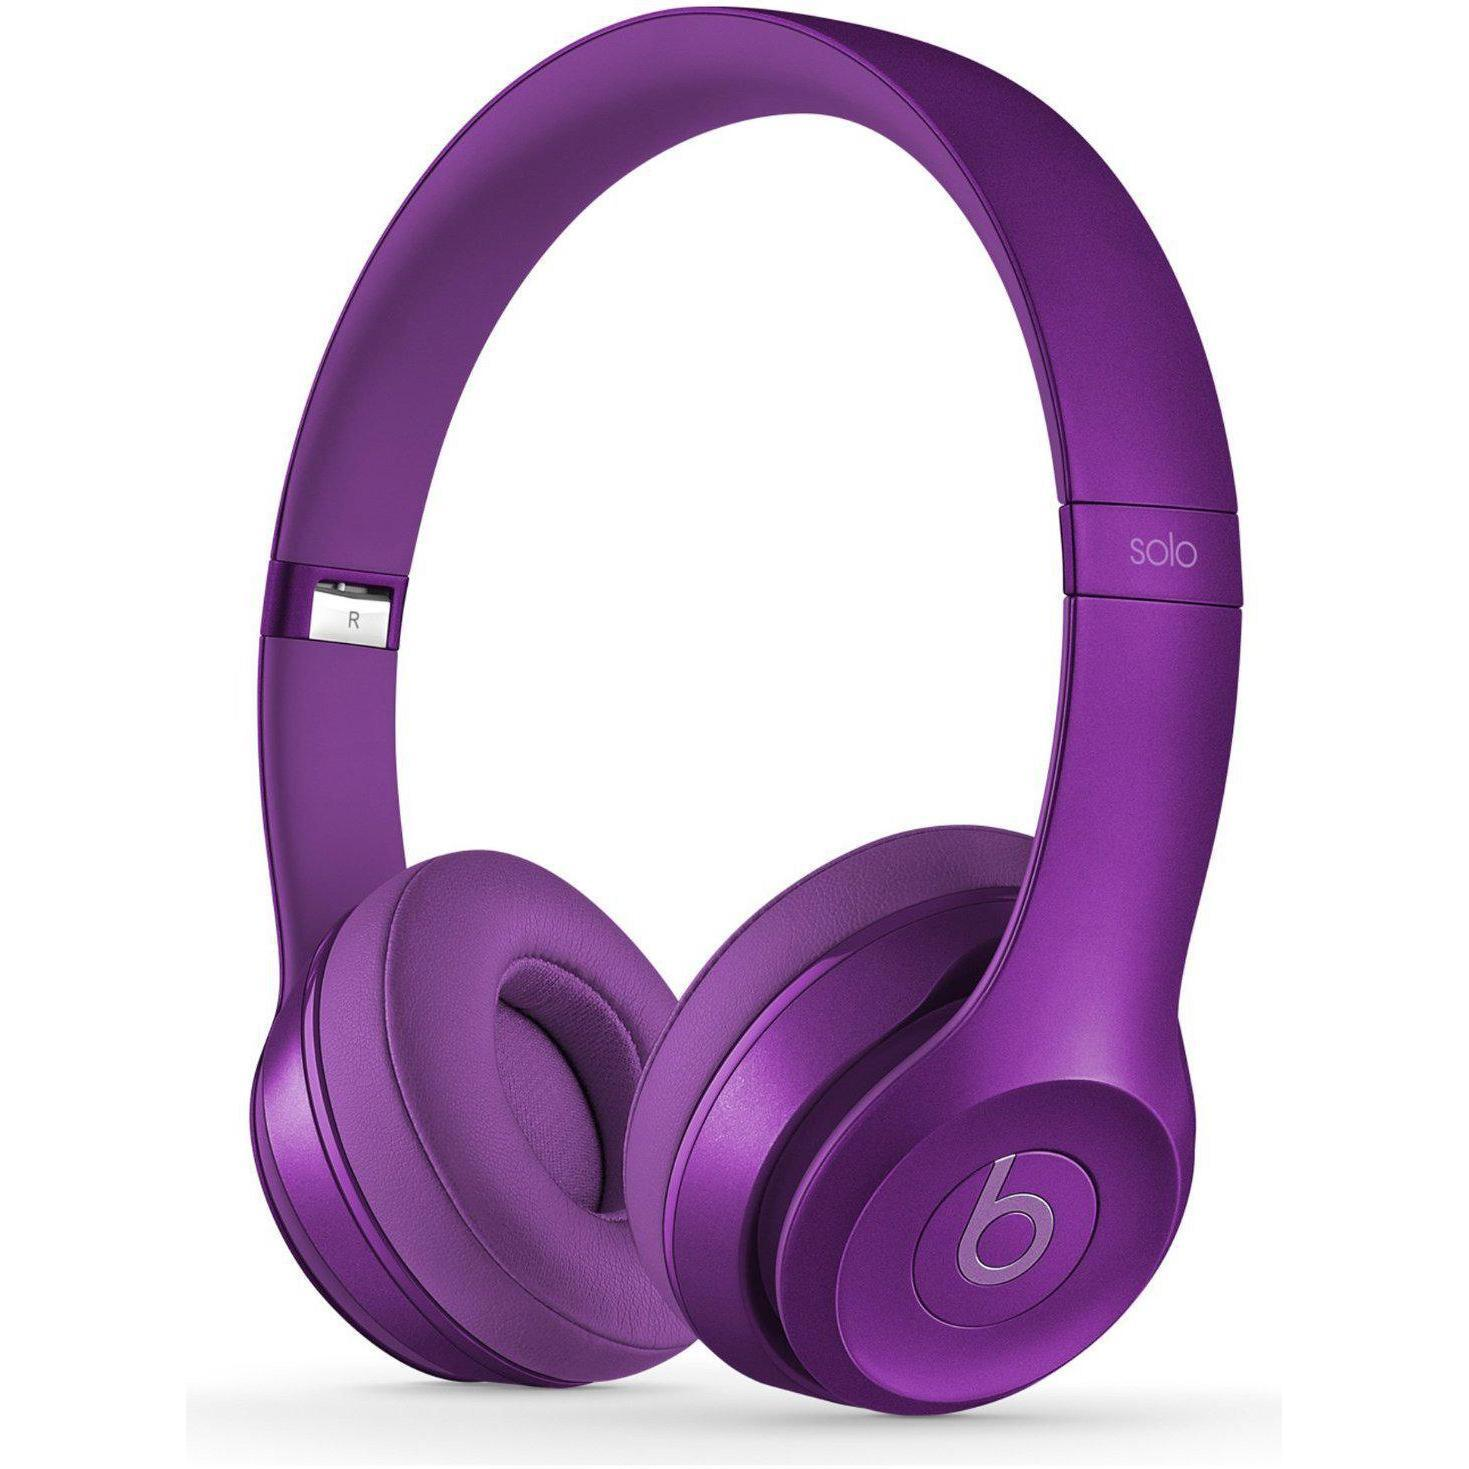 Casque Beats Solo 2 Royal - Imperial Violet